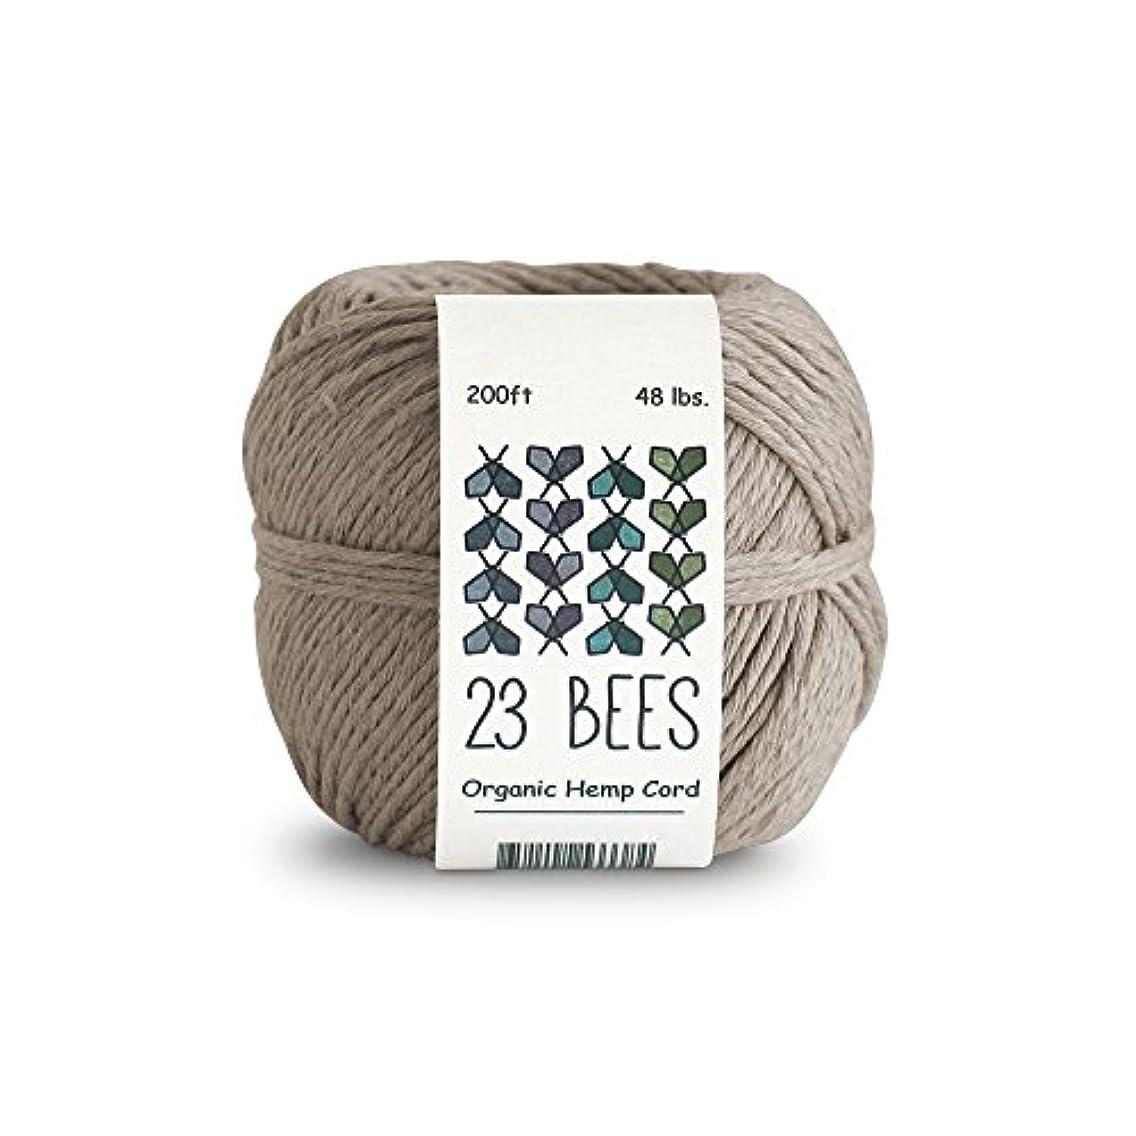 100% Organic Hemp String, Twine, Cord | Jewelry Making, Beading, Macrame, Crafts | 23 Bees (200ft x 48 lb.)